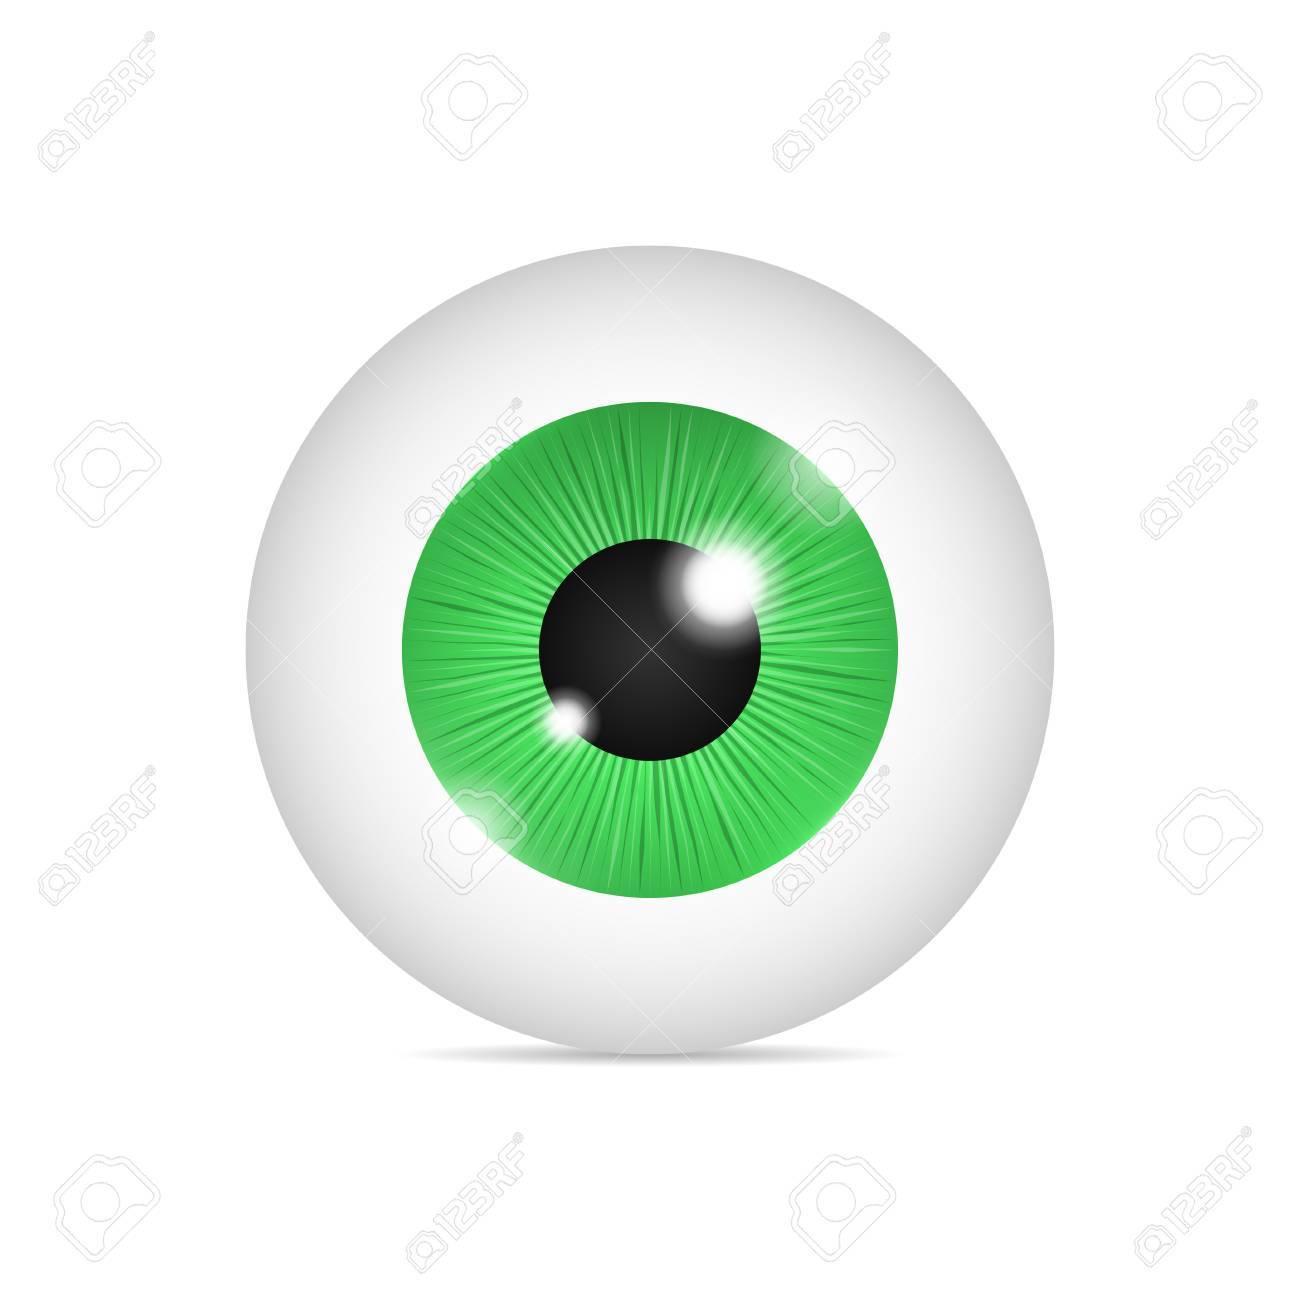 realistic human eyeball royalty free cliparts vectors and stock rh 123rf com flying eyeball vector free vector eyeball